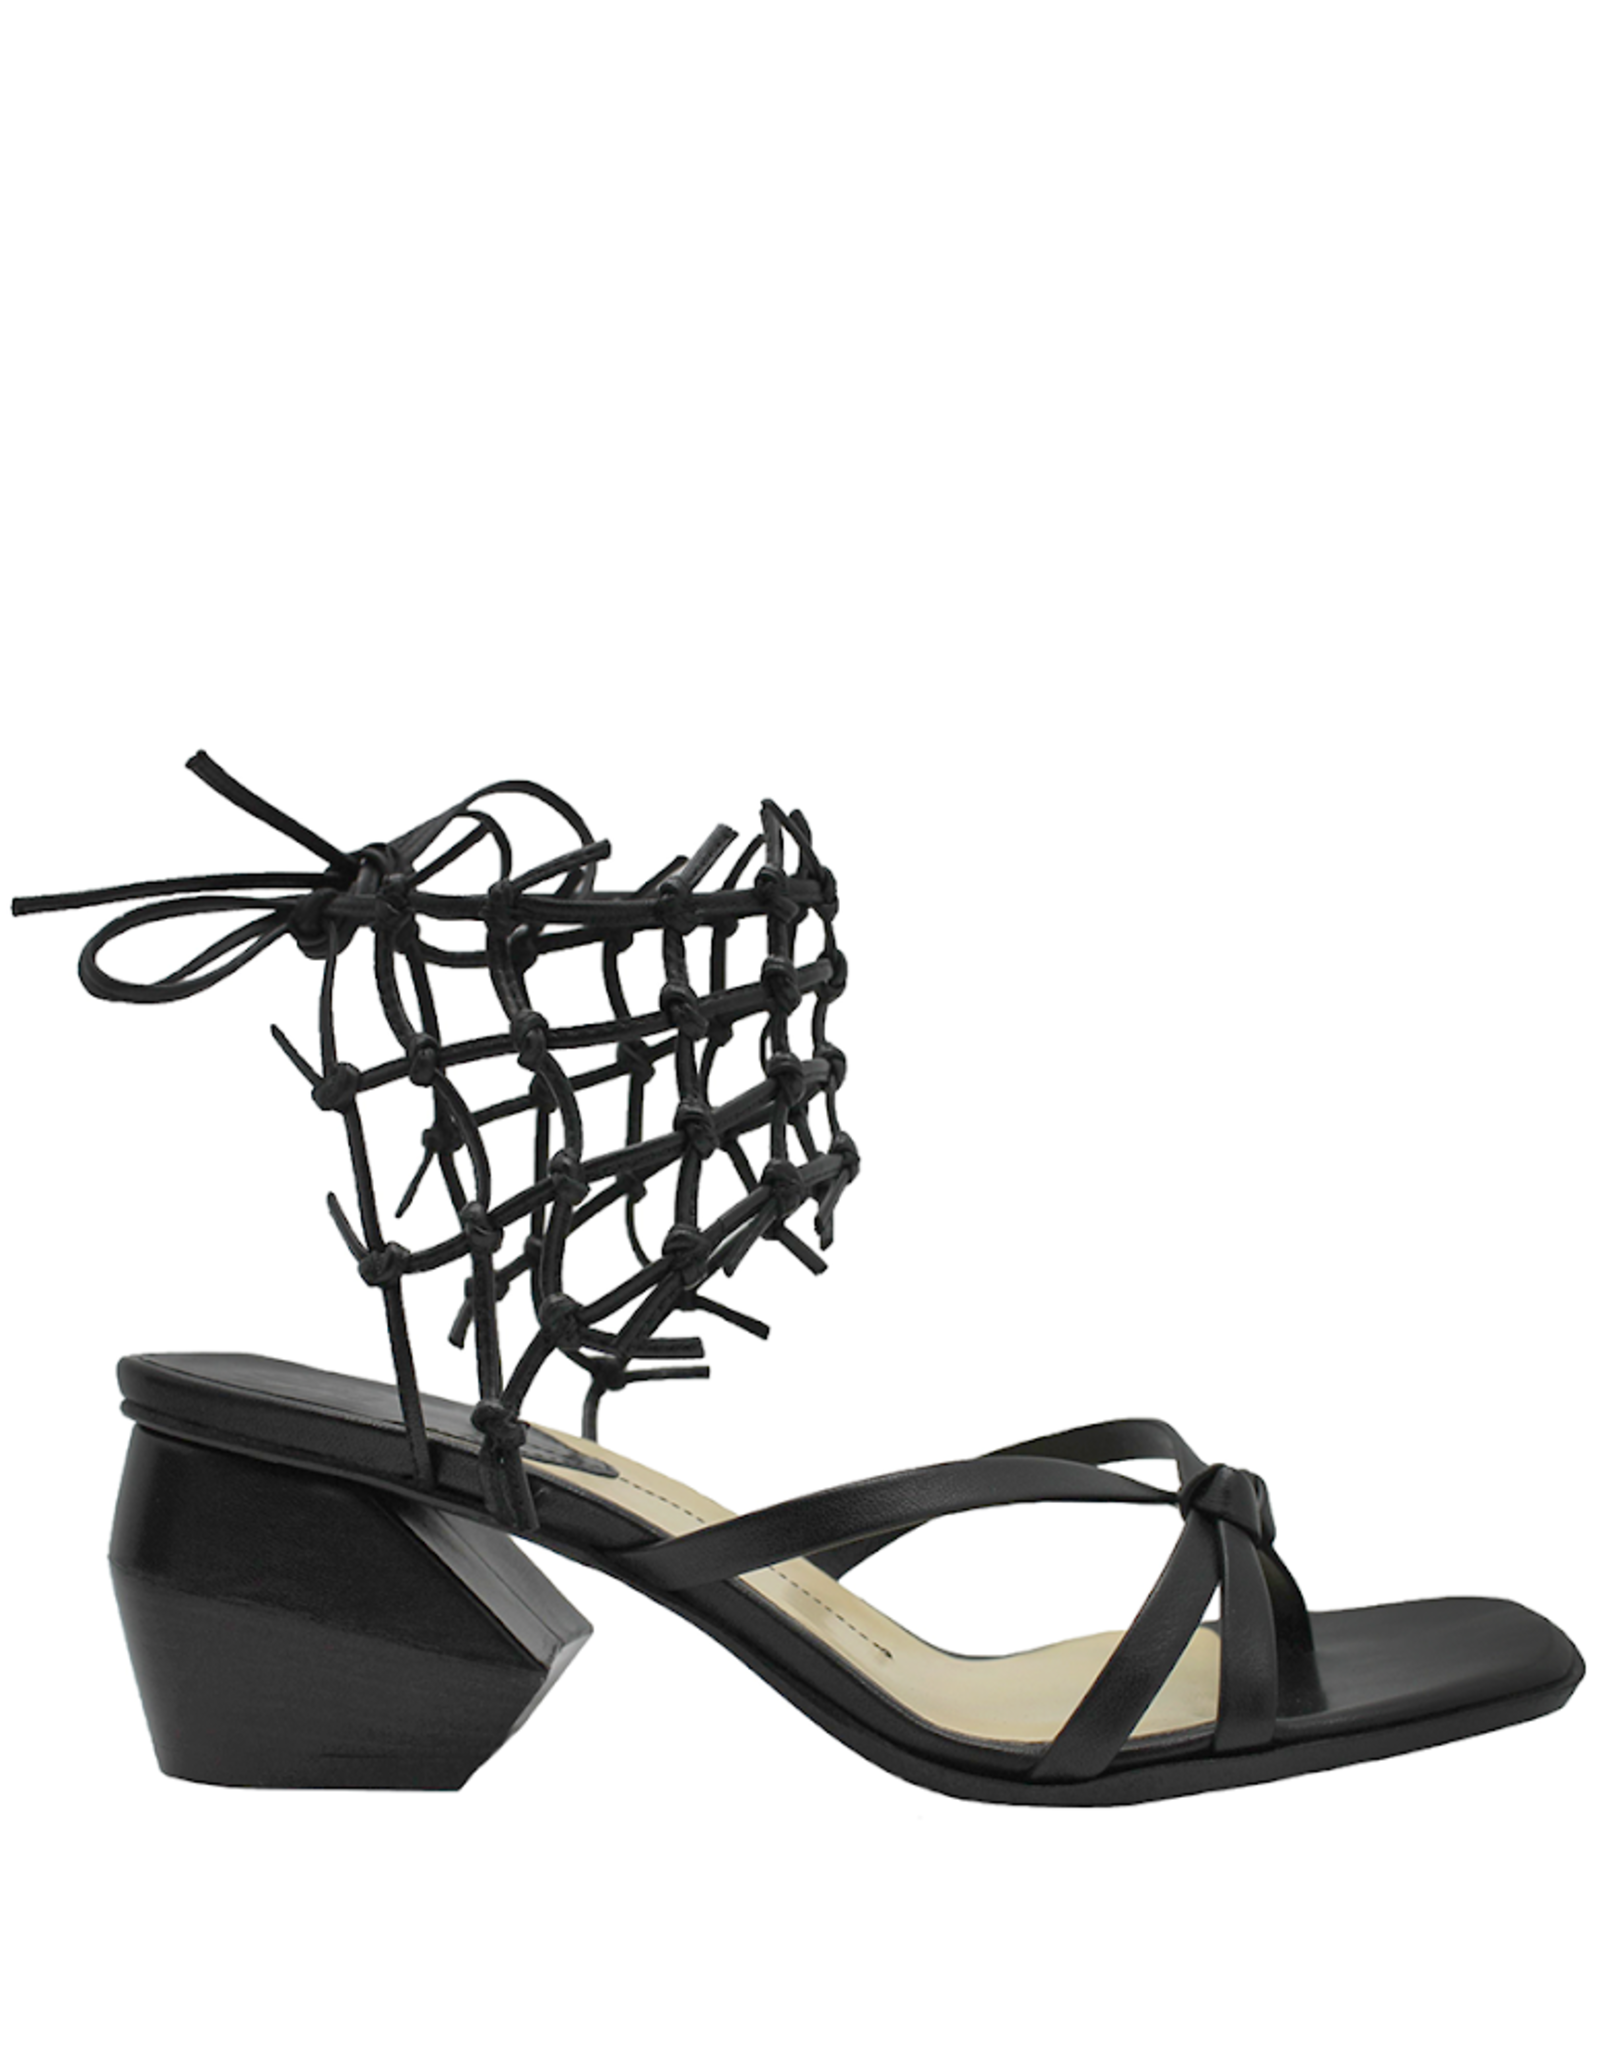 Ixos Ixos Black Ankle Tie Caged Thong Sandal With Block Heel 4007